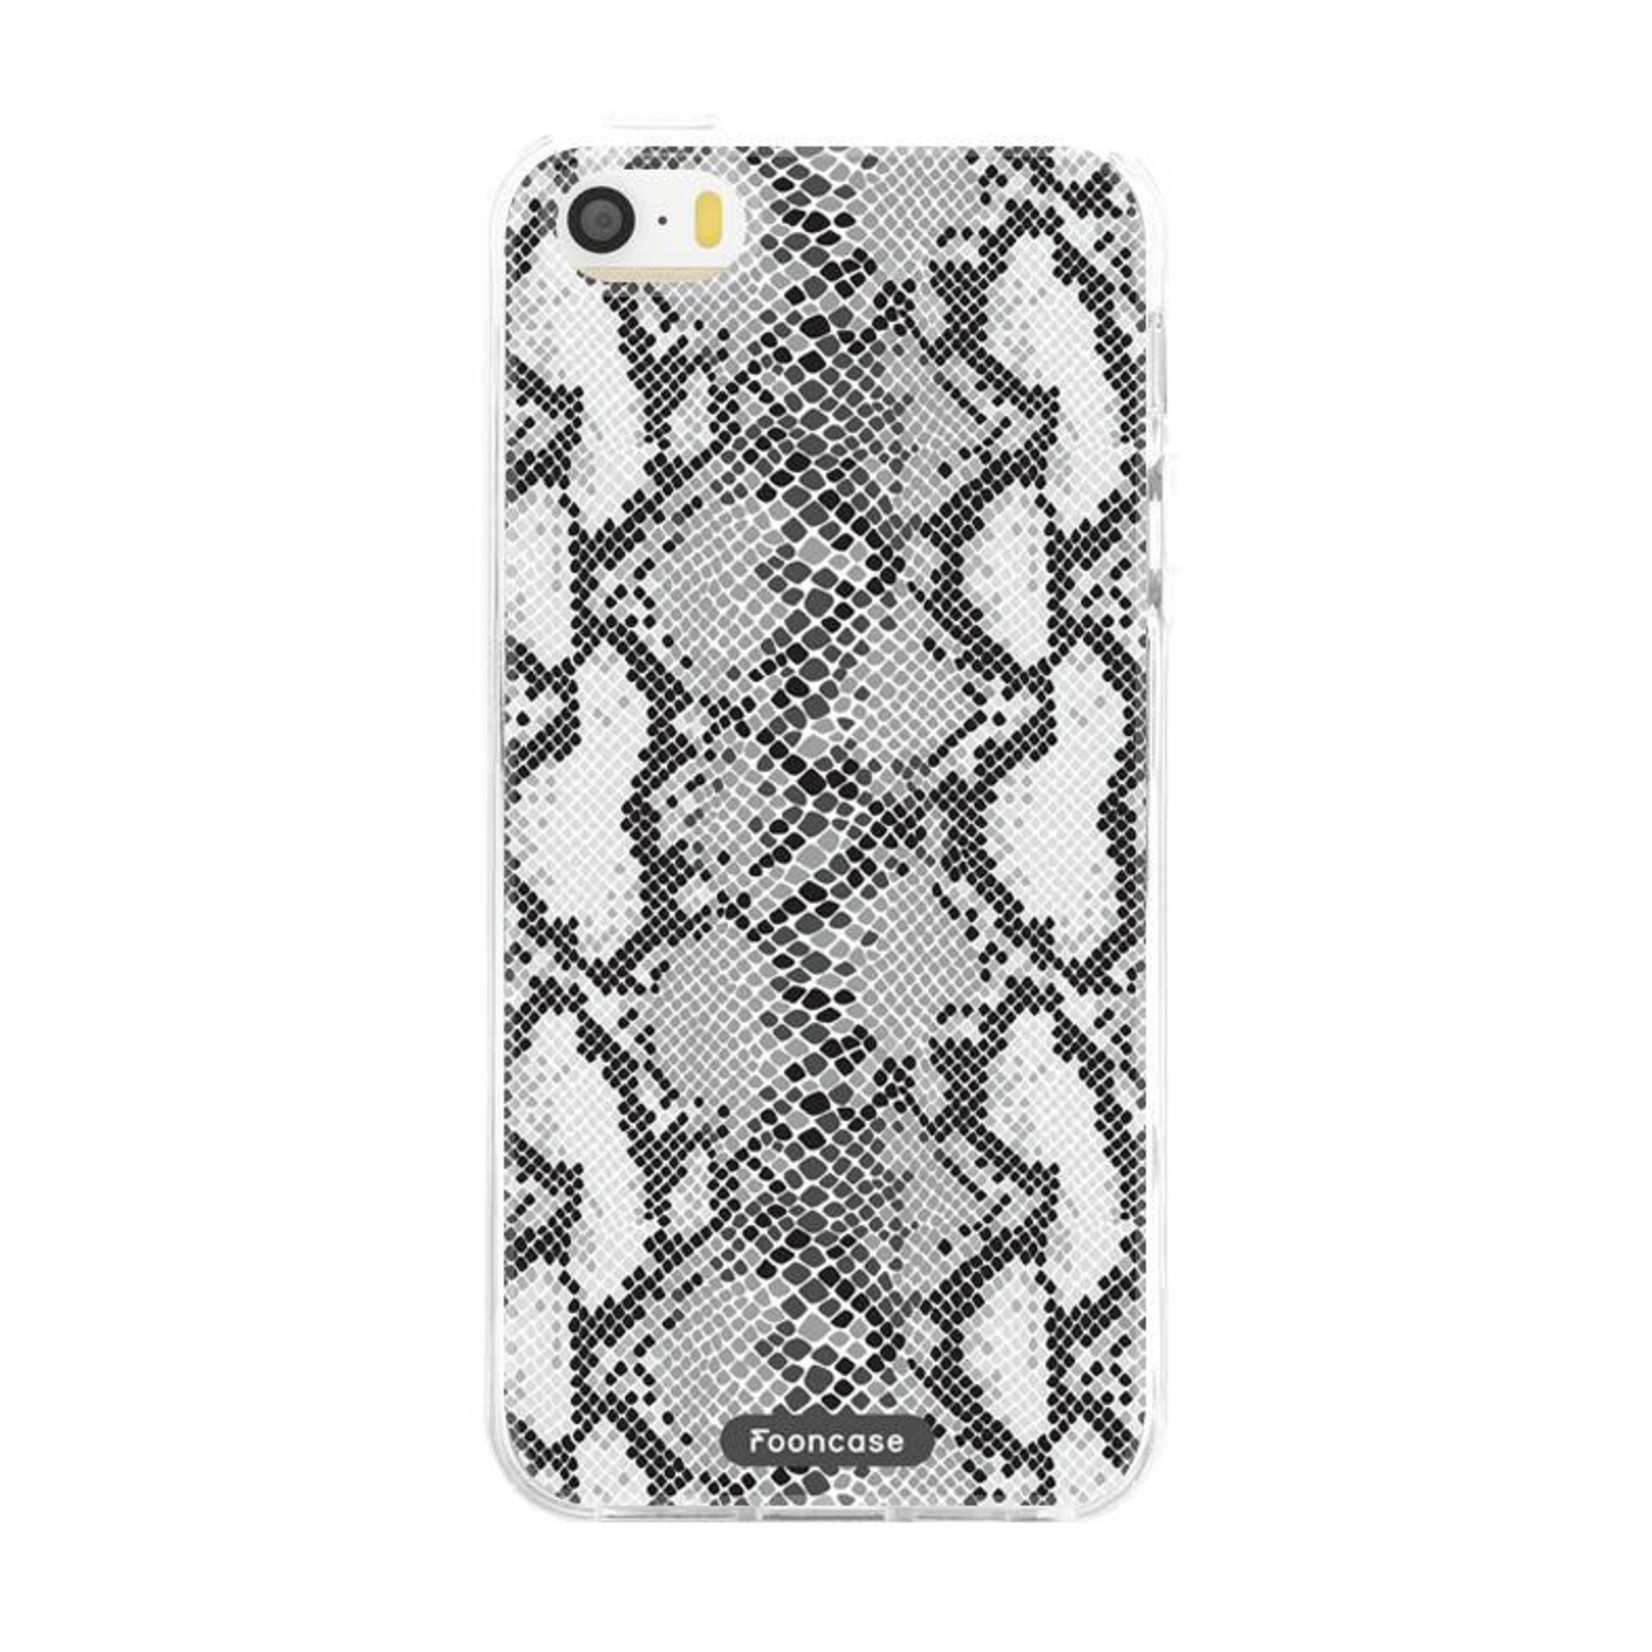 FOONCASE iPhone SE hoesje TPU Soft Case - Back Cover - Snake it / Slangen print